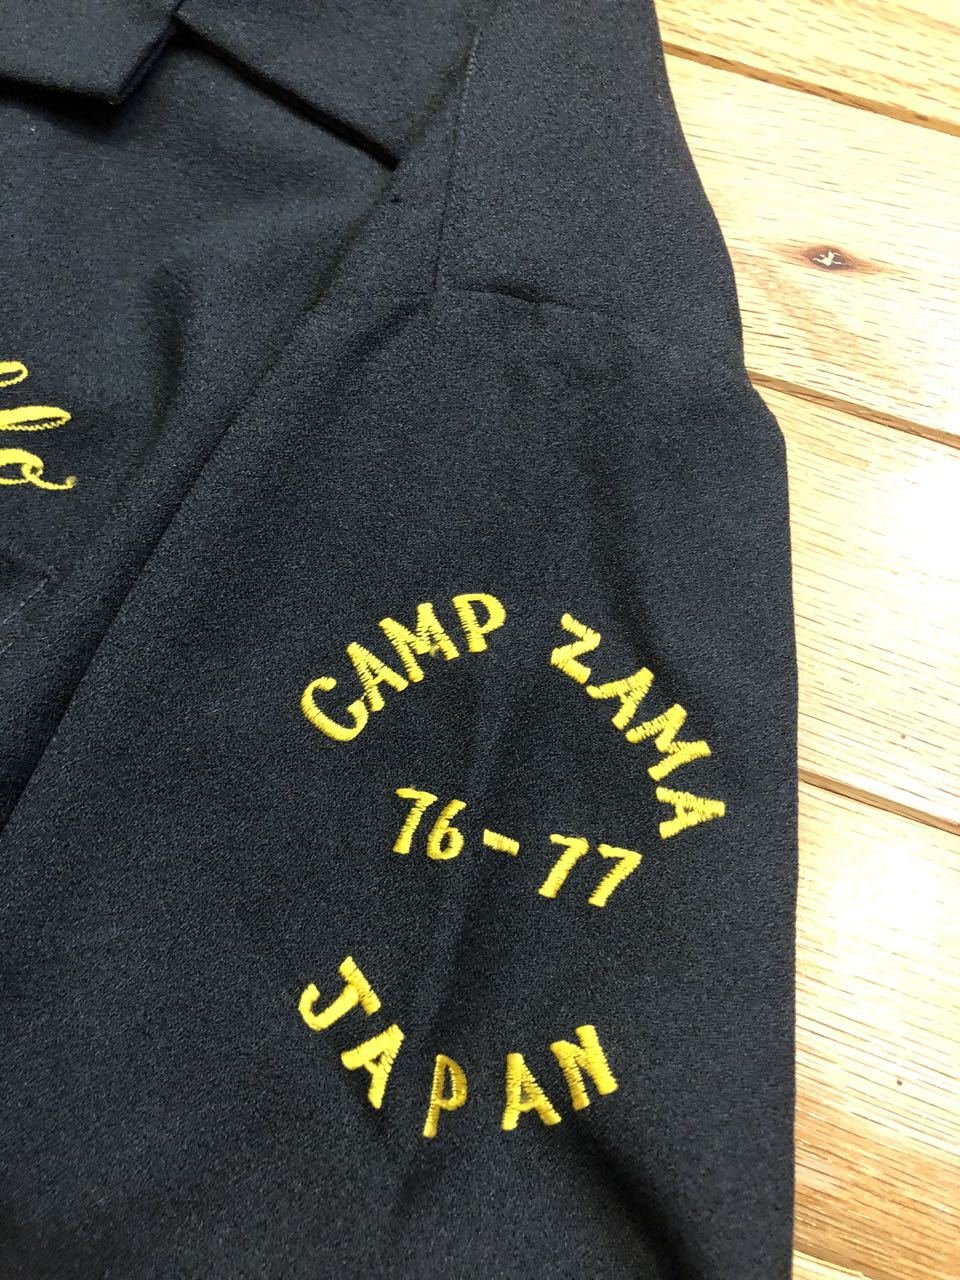 8月1日(土)入荷!70s U.S ARMY HAMAYA YOKOHAMA  CAMP ZAMA Suvenior bowling shirt!_c0144020_13365681.jpg